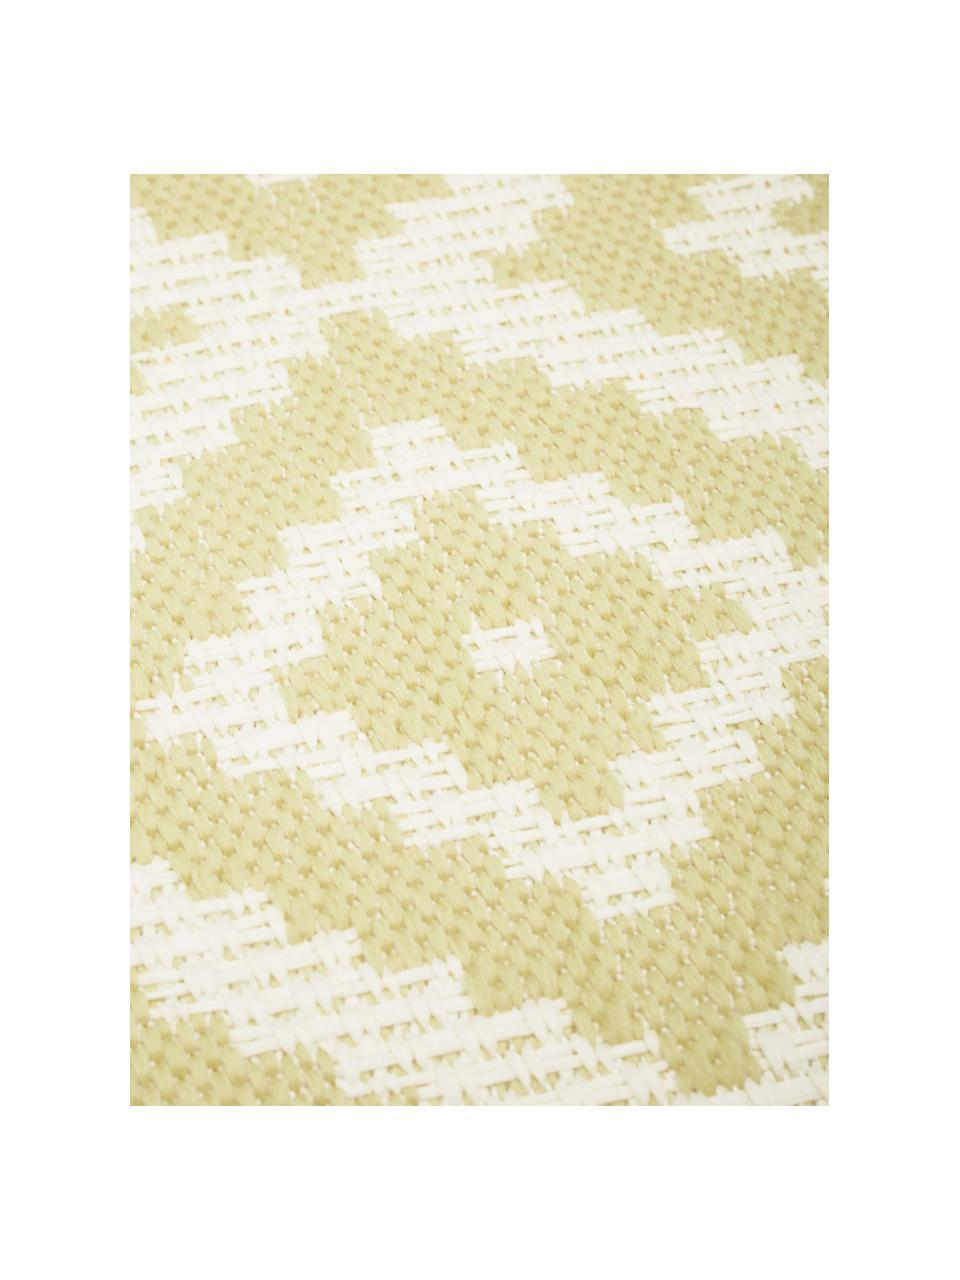 Passatoia fantasia gialla/bianca da interno-esterno Miami, 86% polipropilene, 14% poliestere, Bianco, giallo, Larg. 80 x Lung. 250 cm